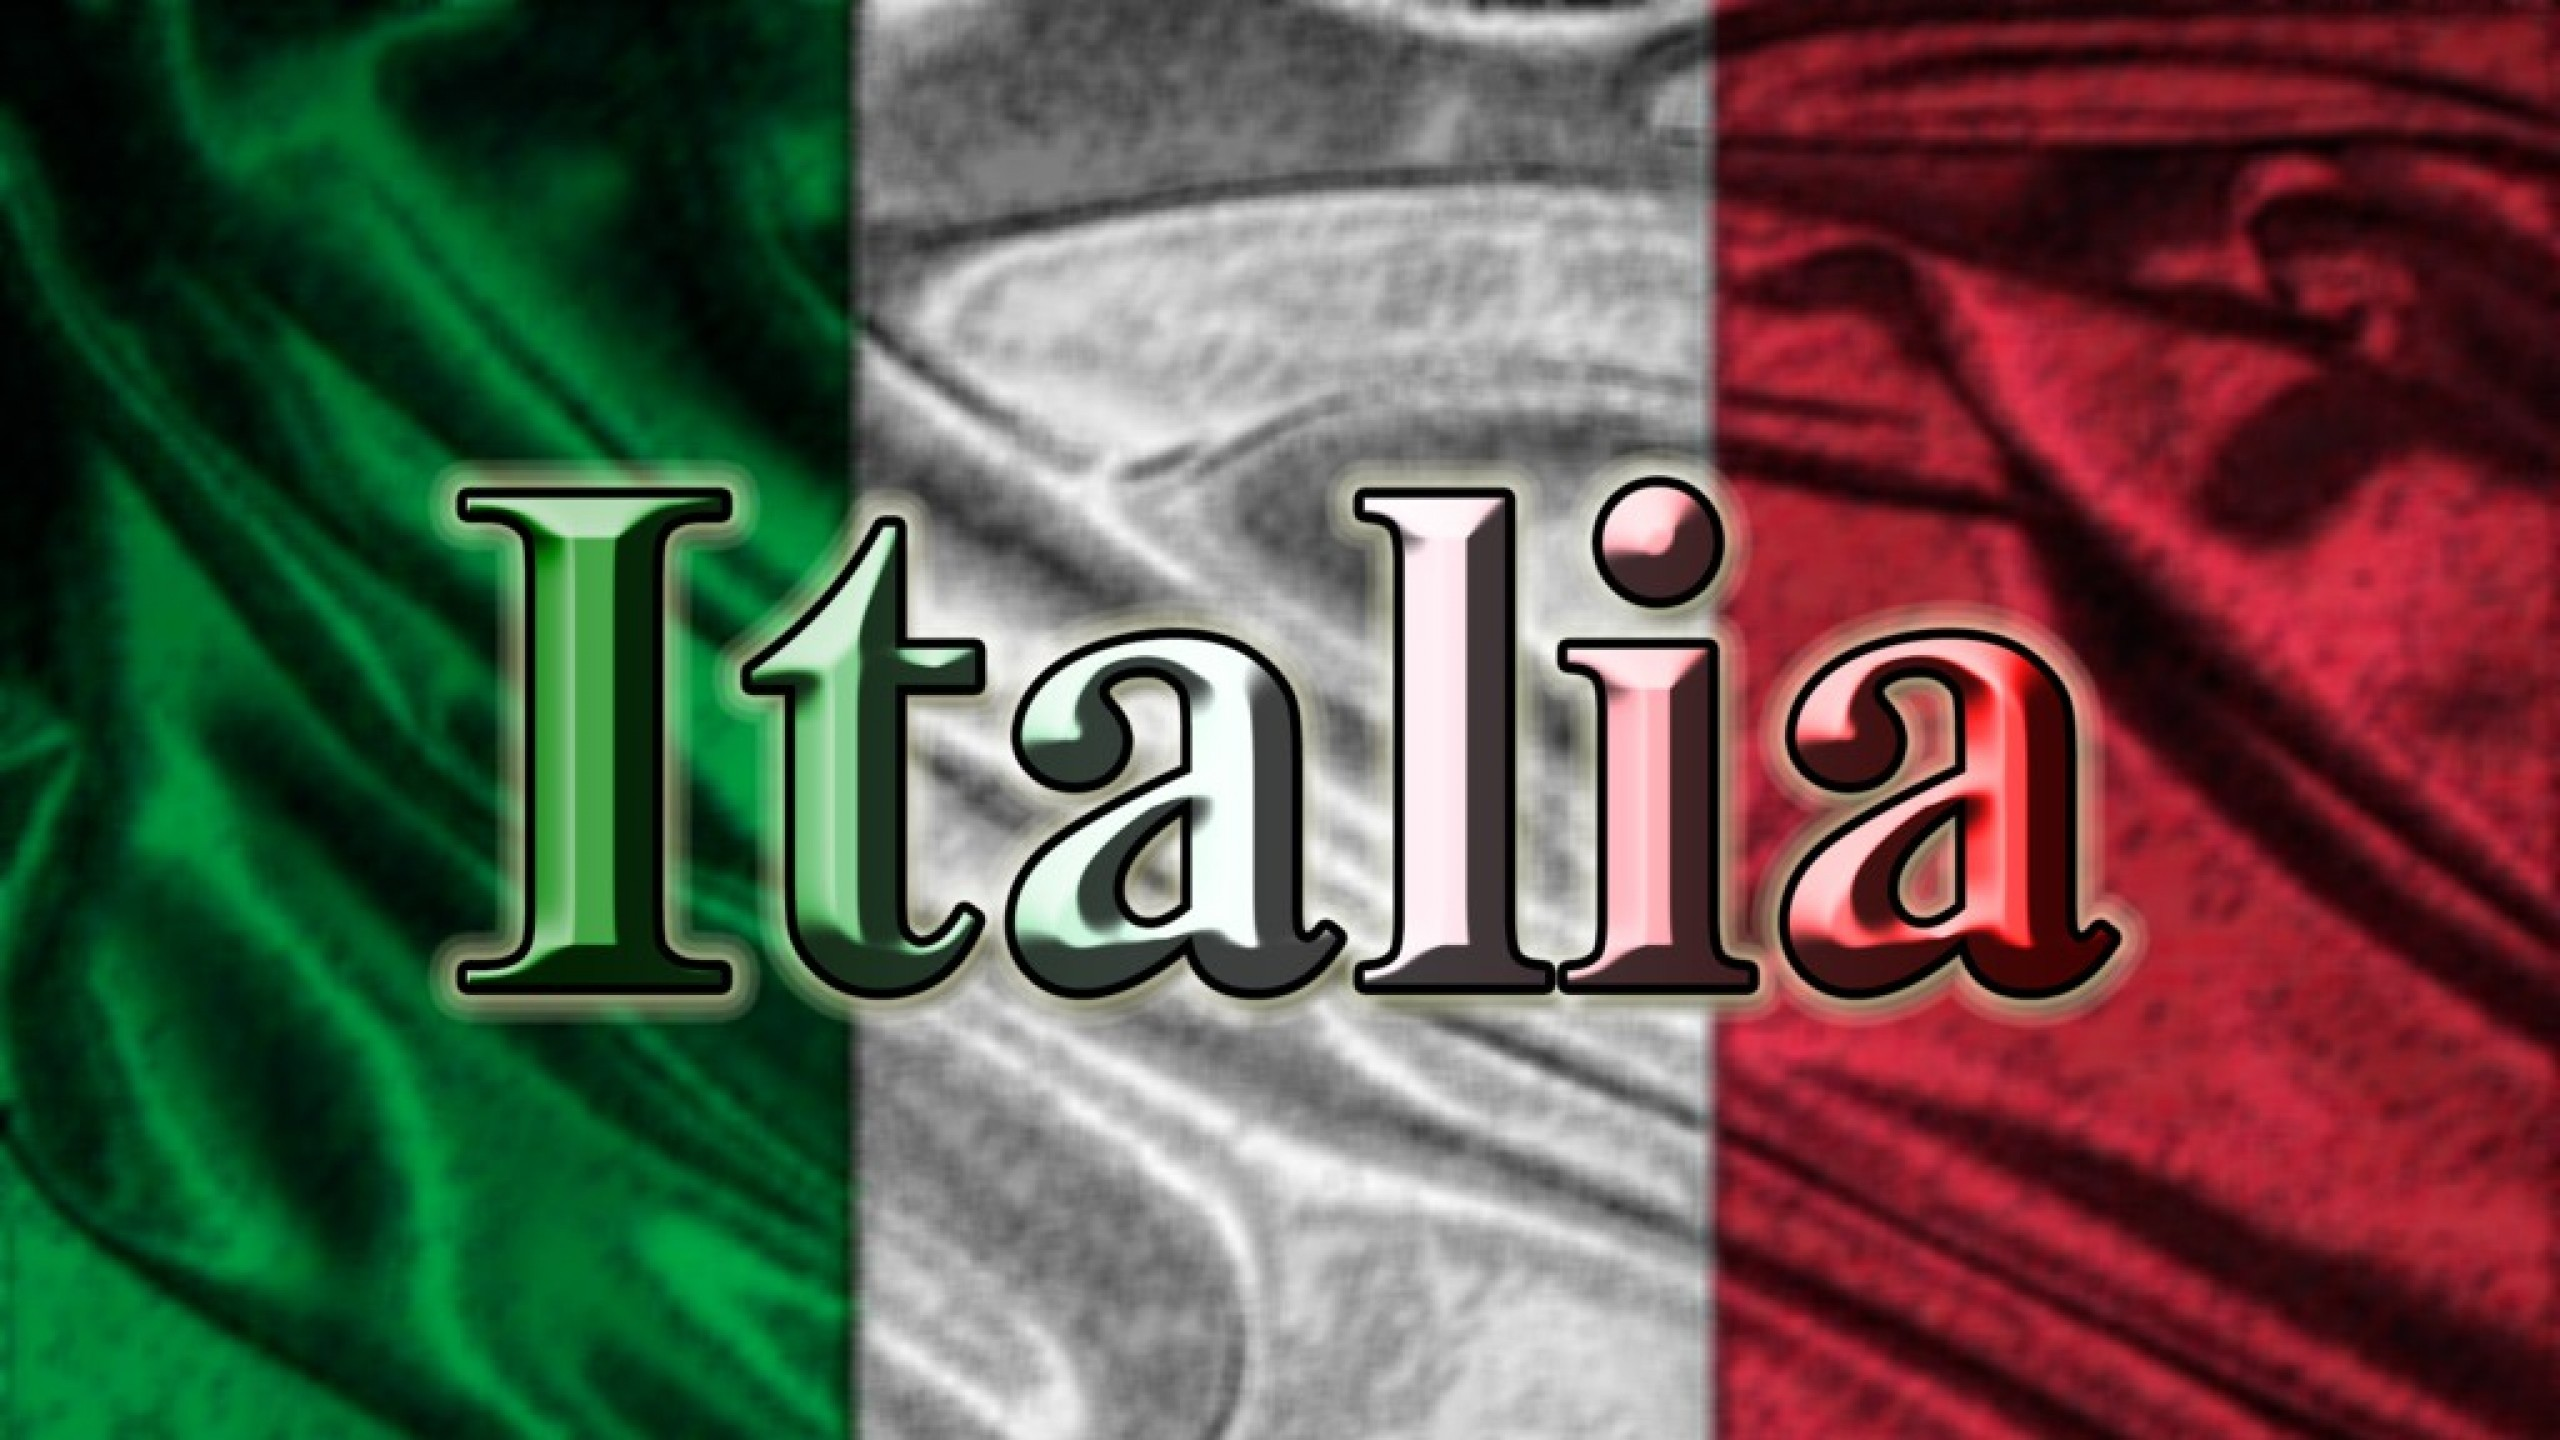 Chicago Blackhawks Wallpaper Iphone 6 Italian Flag Iphone Wallpaper 60 Images